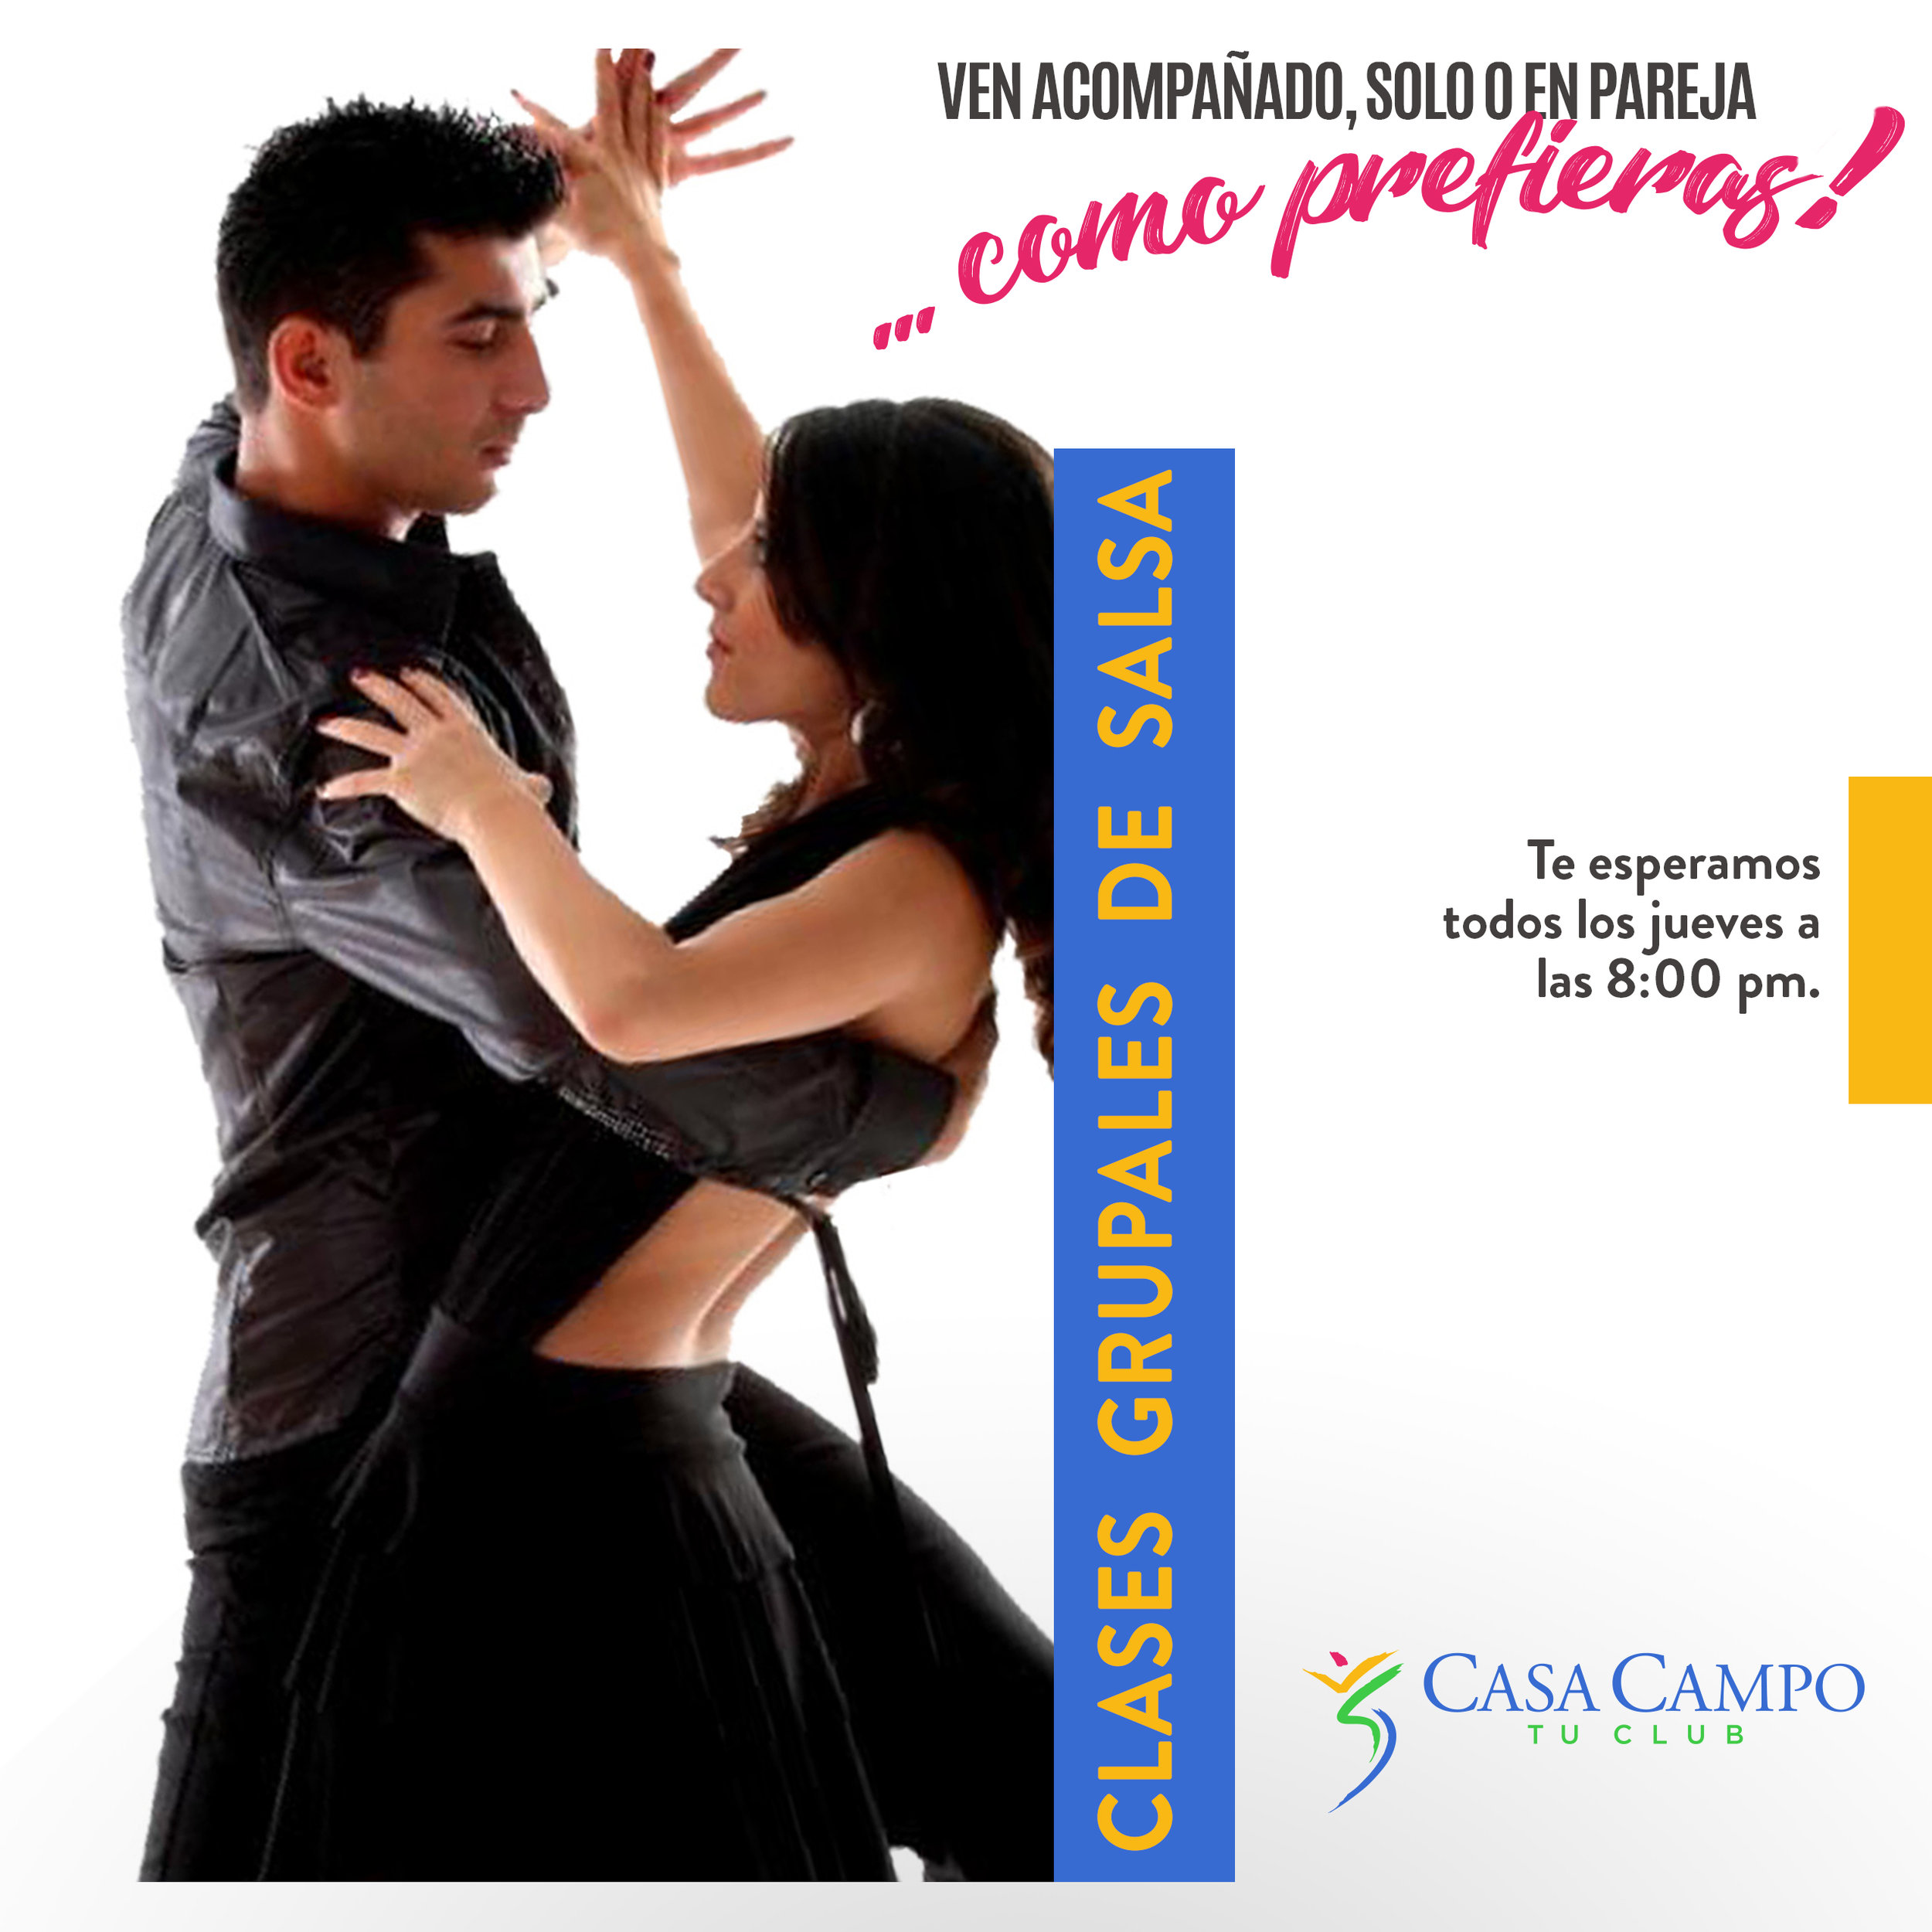 clases_de_salsa_whatsapp.jpg